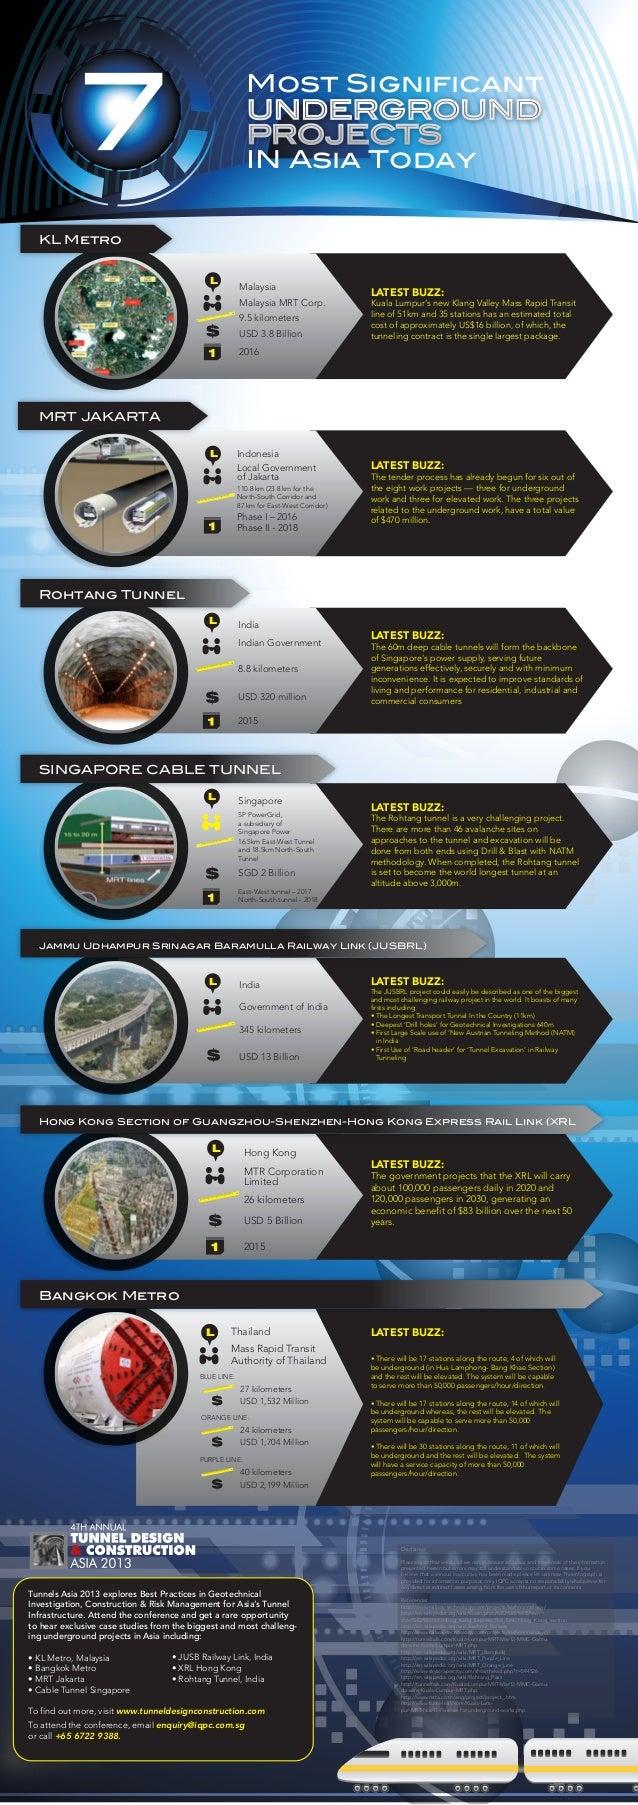 Most Significant IN Asia Today KL Metro L  Malaysia Malaysia MRT Corp. 9.5 kilometers USD 3.8 Billion  LATEST BUZZ:  Kuala...